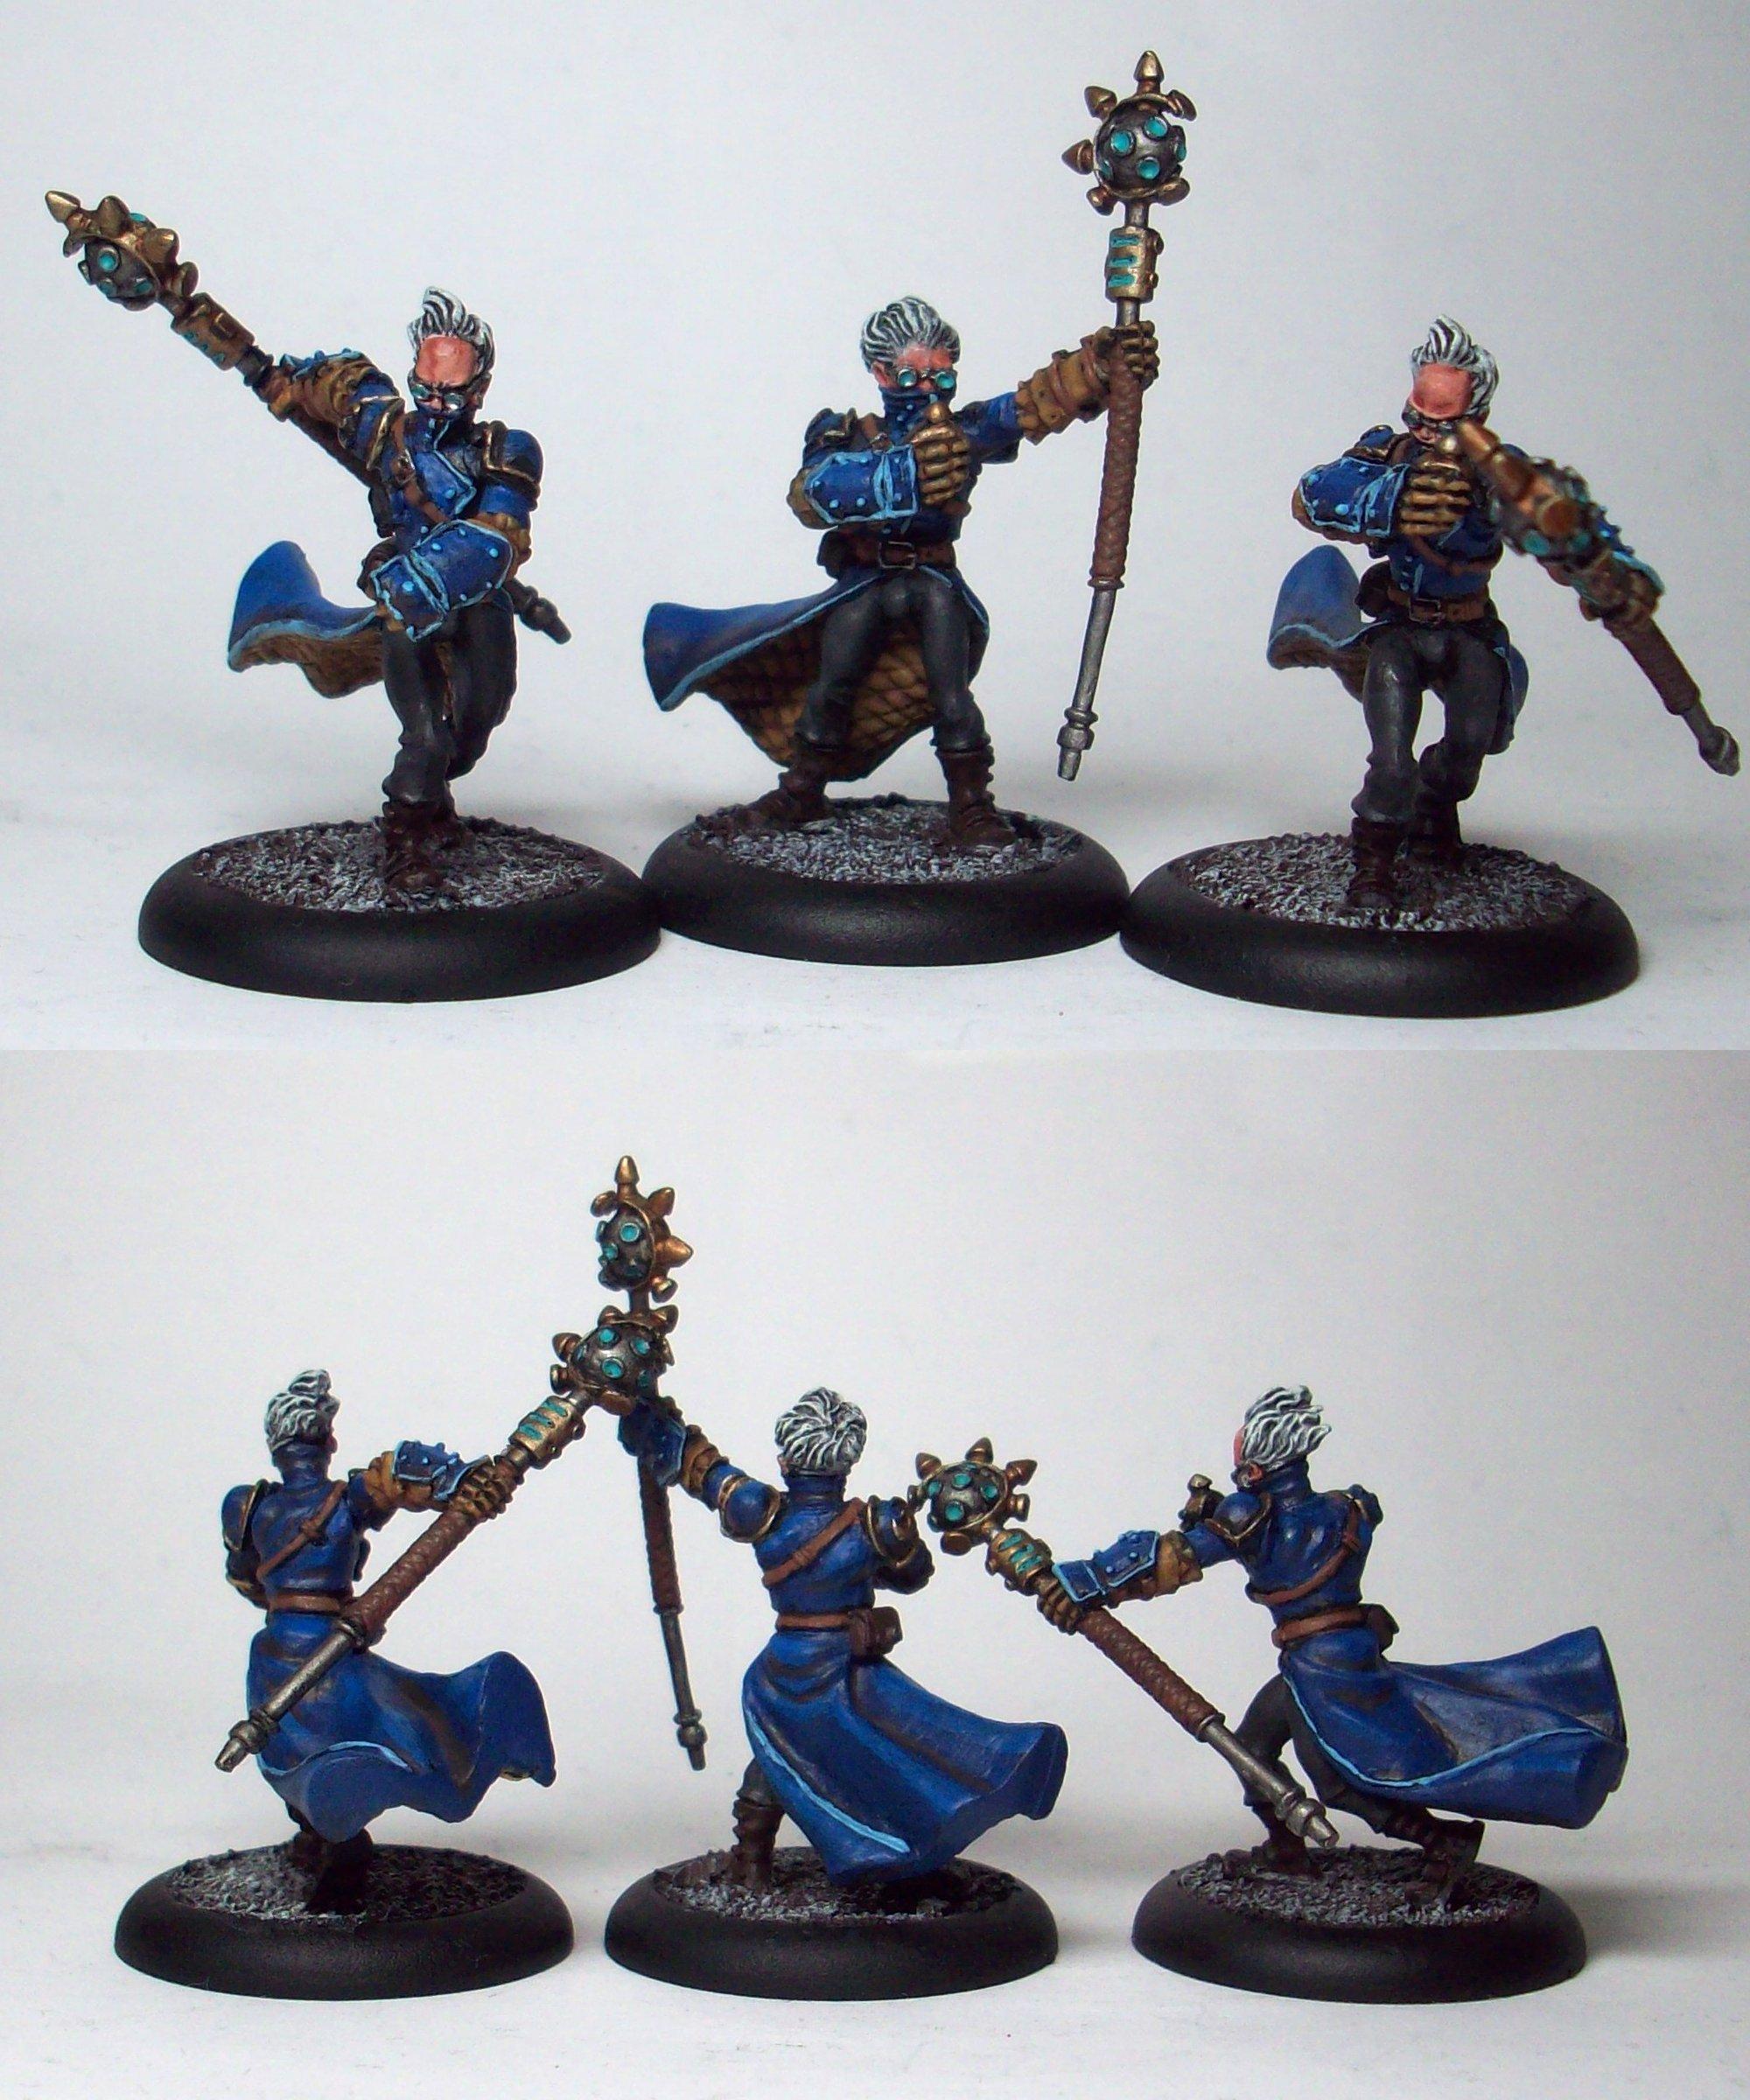 Cygnar, Solo, Stormsmith